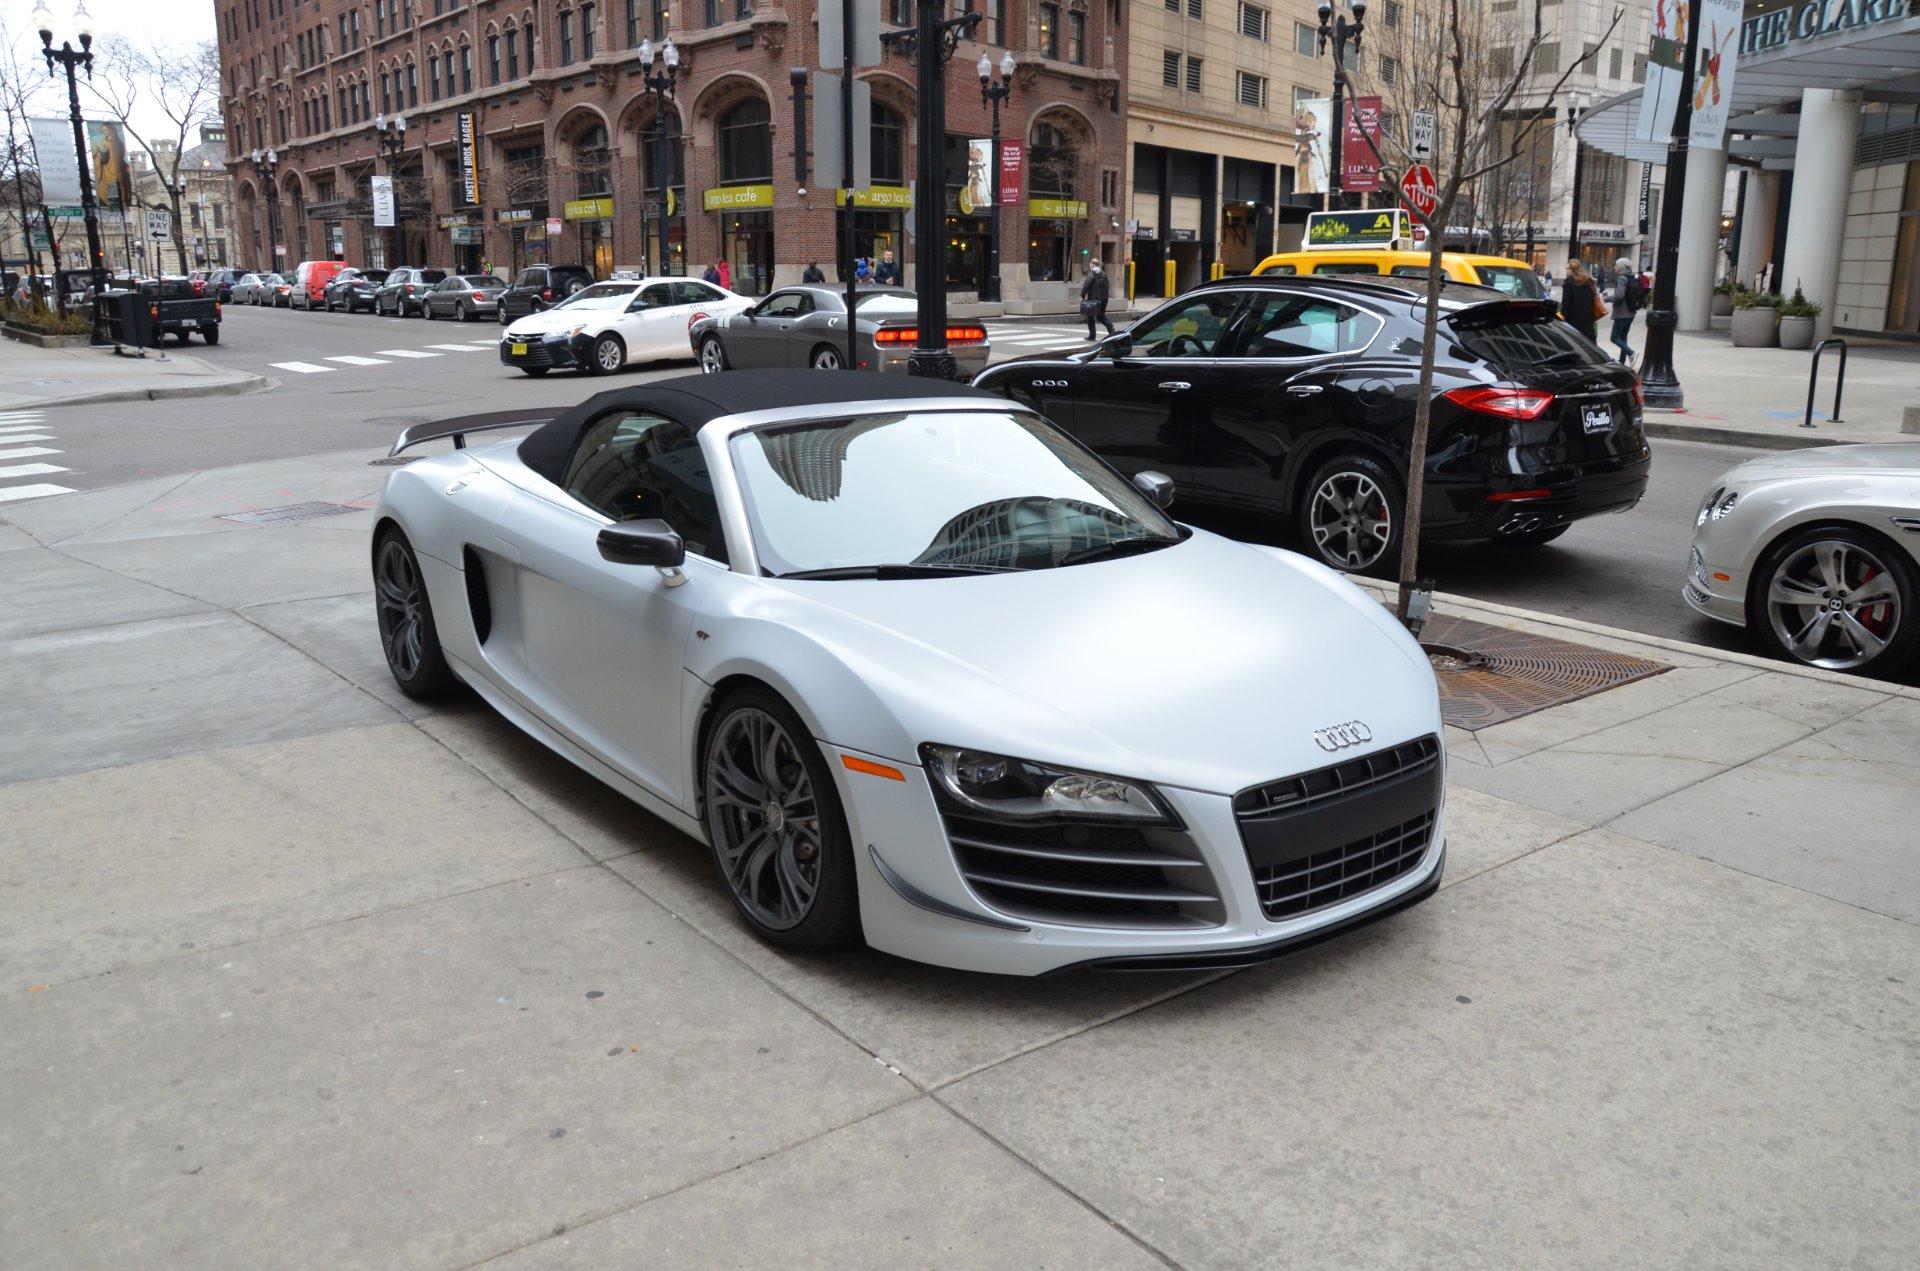 Used 2012 Audi R8 GT 5.2 quattro Spyder | Chicago, IL